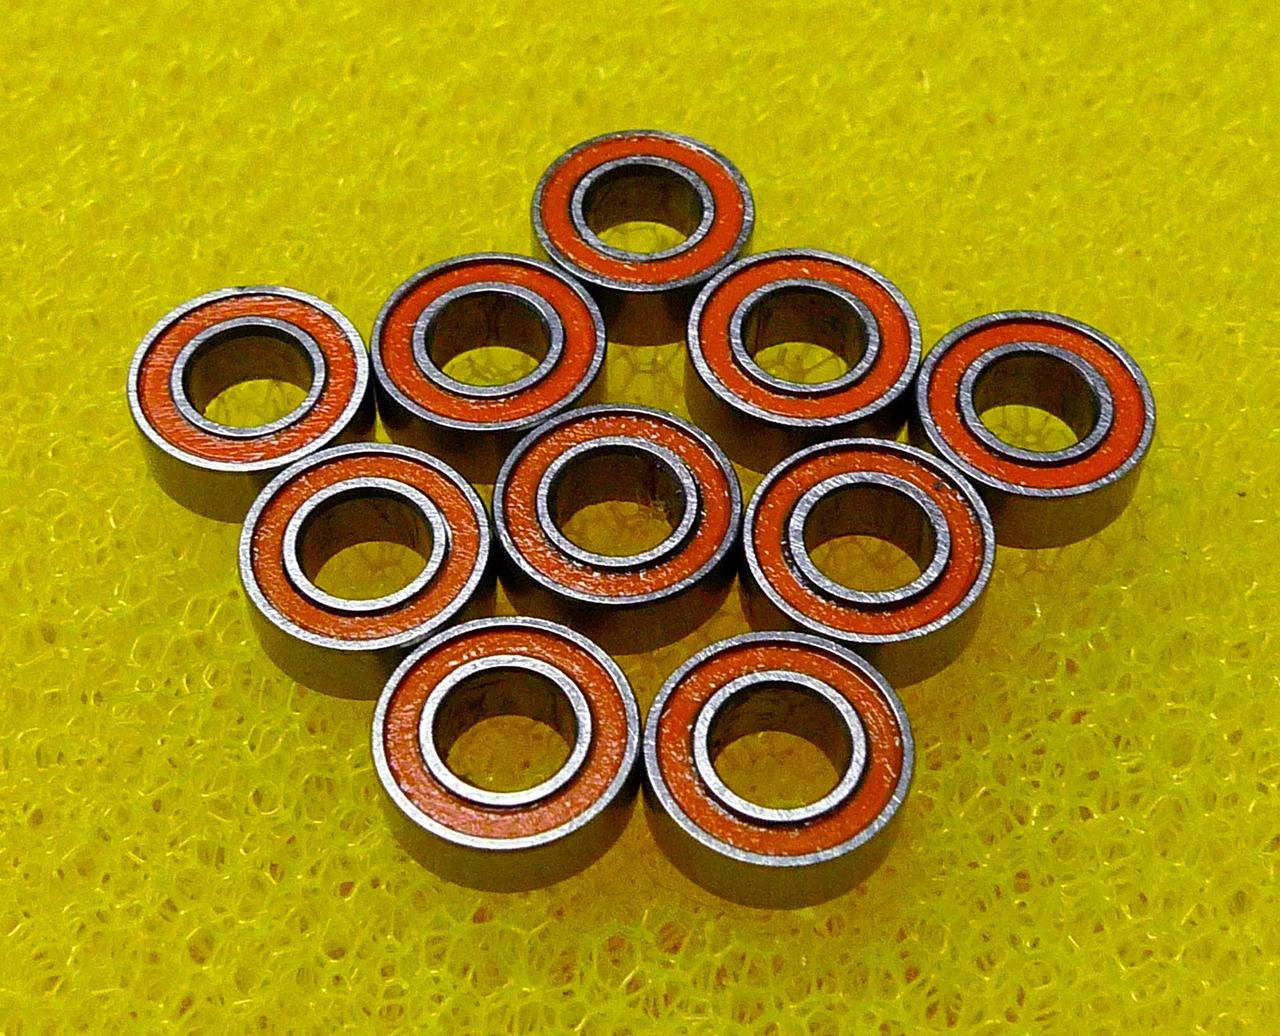 440c CERAMIC Stainless Steel Bearing ABEC-7 SMR128-2RS 10 PCS 8x12x3.5 mm